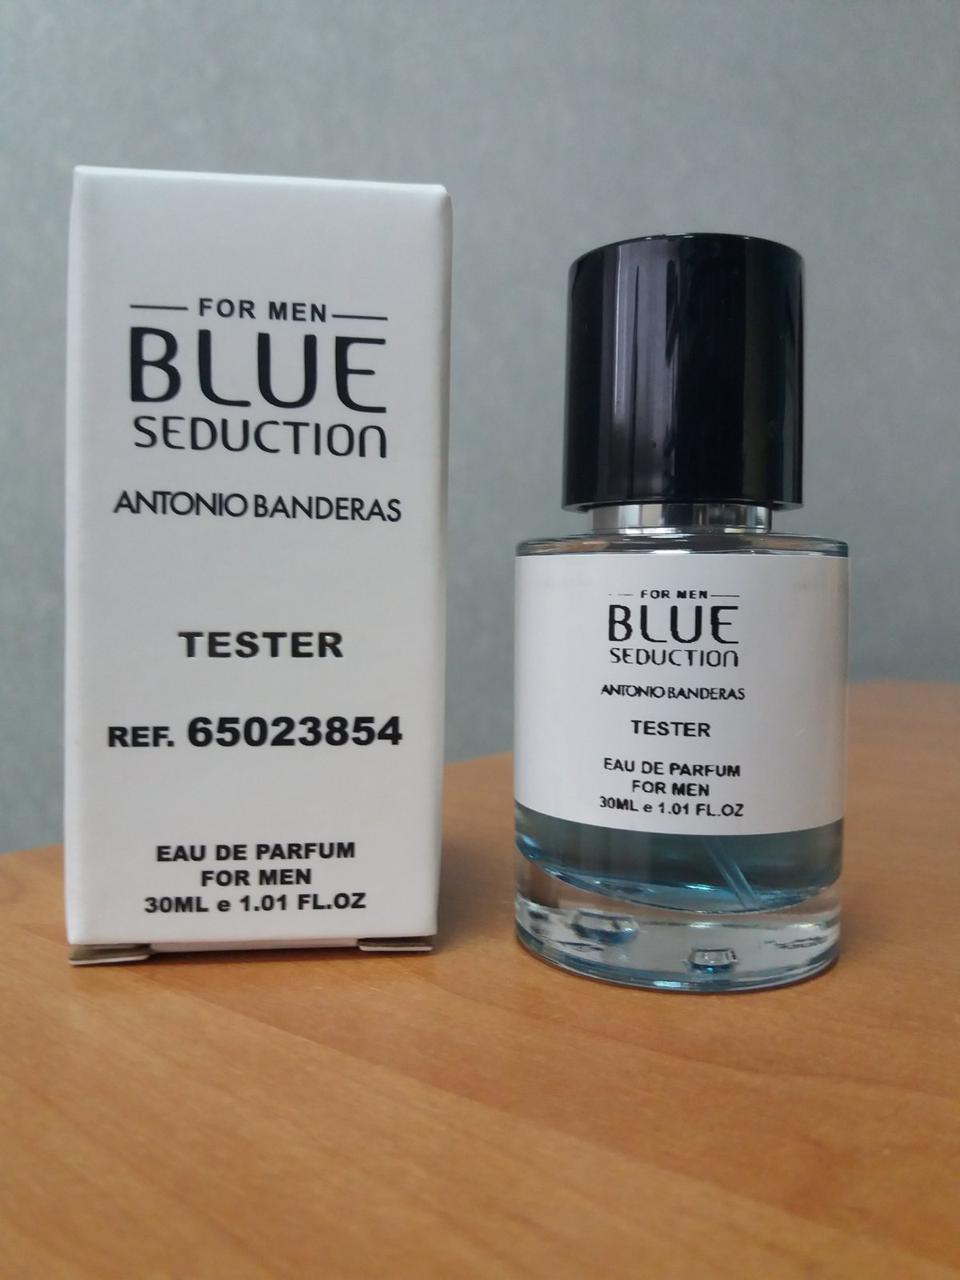 Antonio Banderas Seduction Blue мужской парфюм тестер 30 ml (реплика)